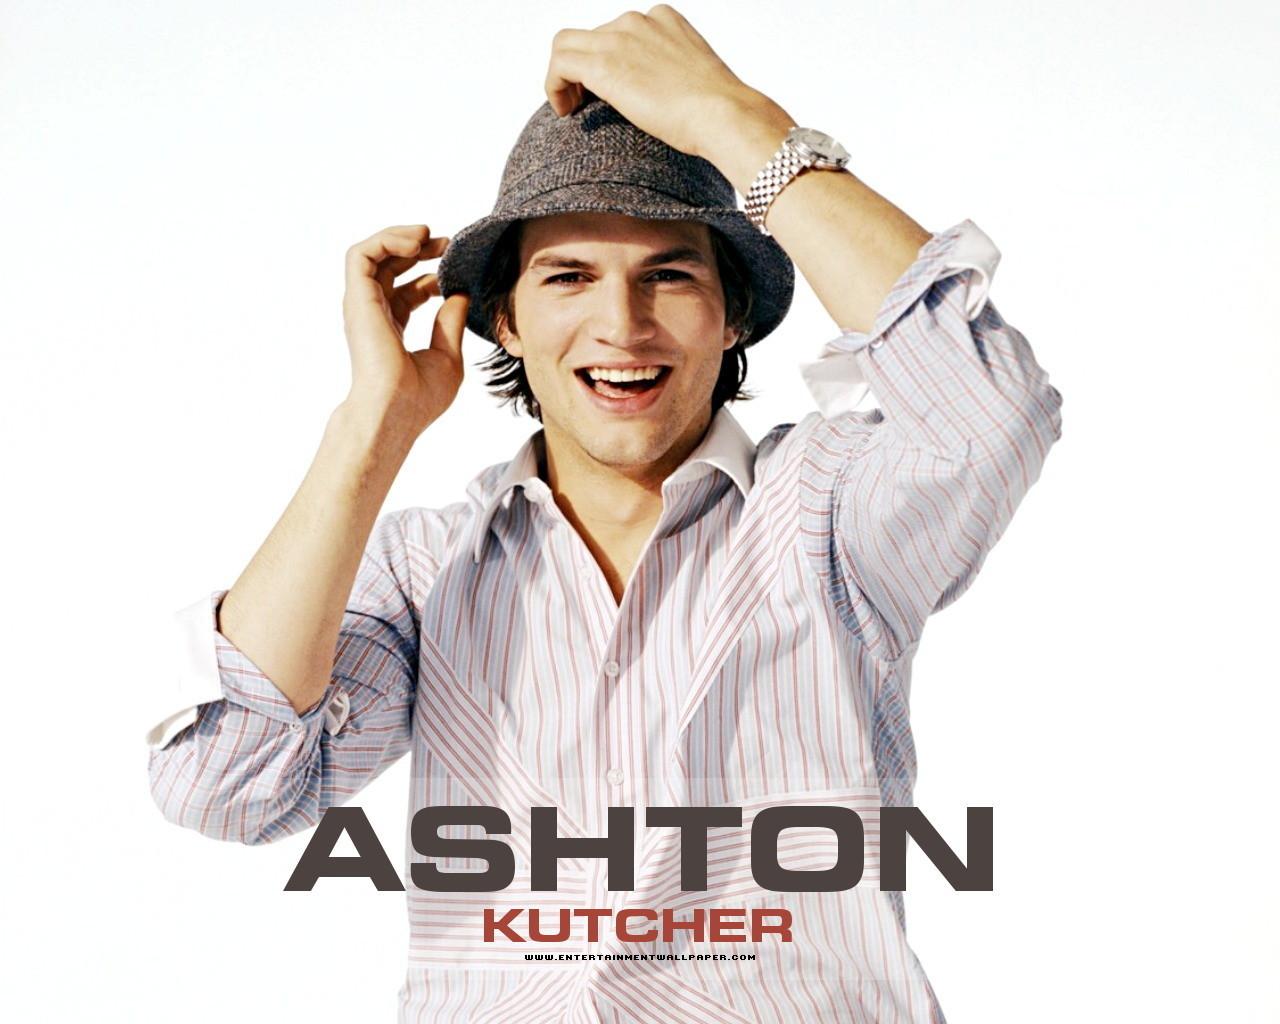 http://4.bp.blogspot.com/_dRwDJbOL9k4/Swwnv9y2ZqI/AAAAAAAACAE/Ba6EJuByJcg/s1600/Ashton-Kutcher+(8).jpg